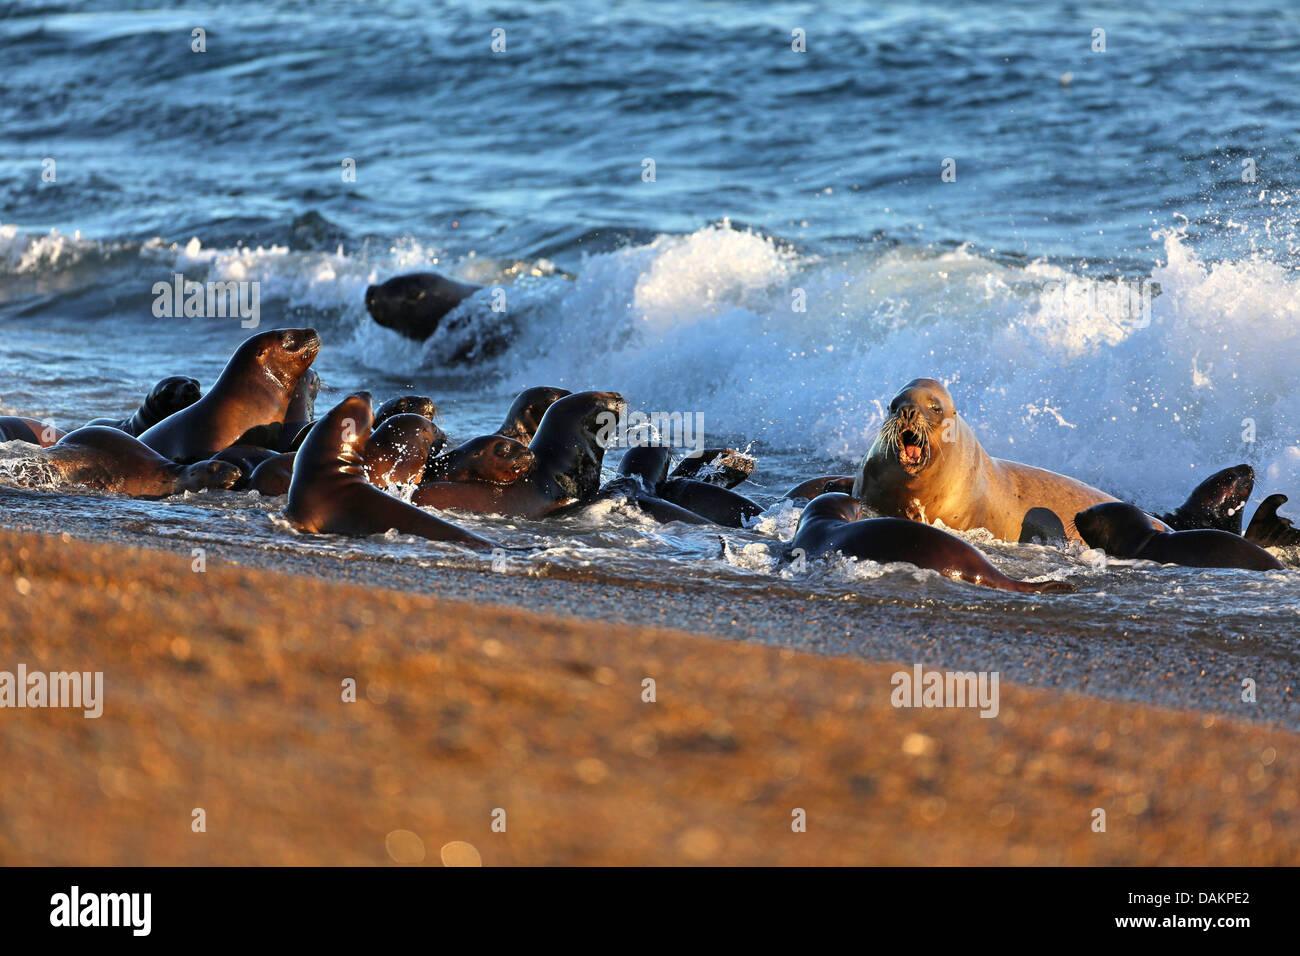 Southern sea lion, South American sea lion, Patagonian sea lion (Otaria flavescens, Otaria byronia), group of puppies Stock Photo